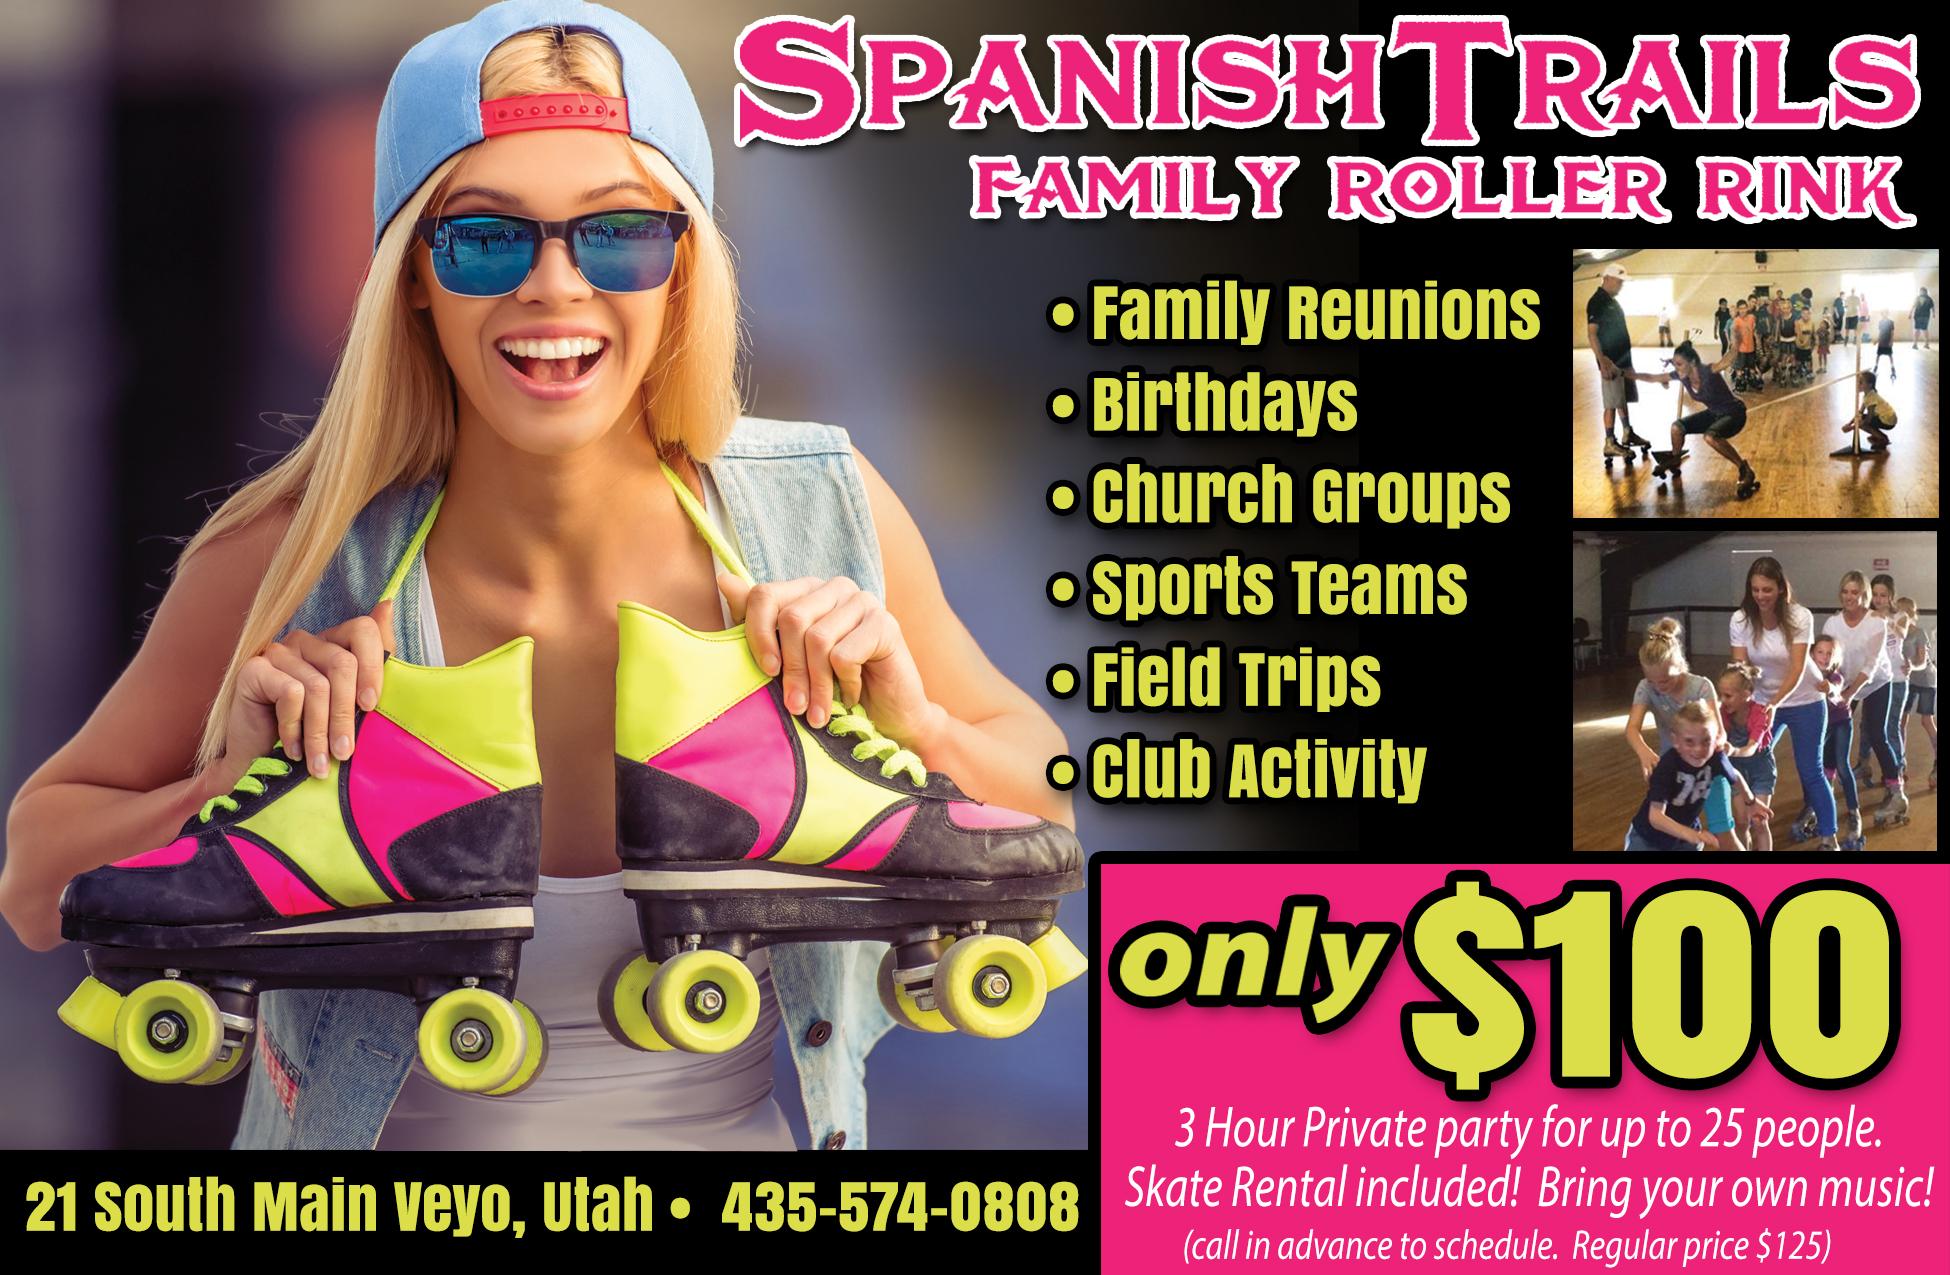 Spanish Trails Family Roller Rink - roller skating